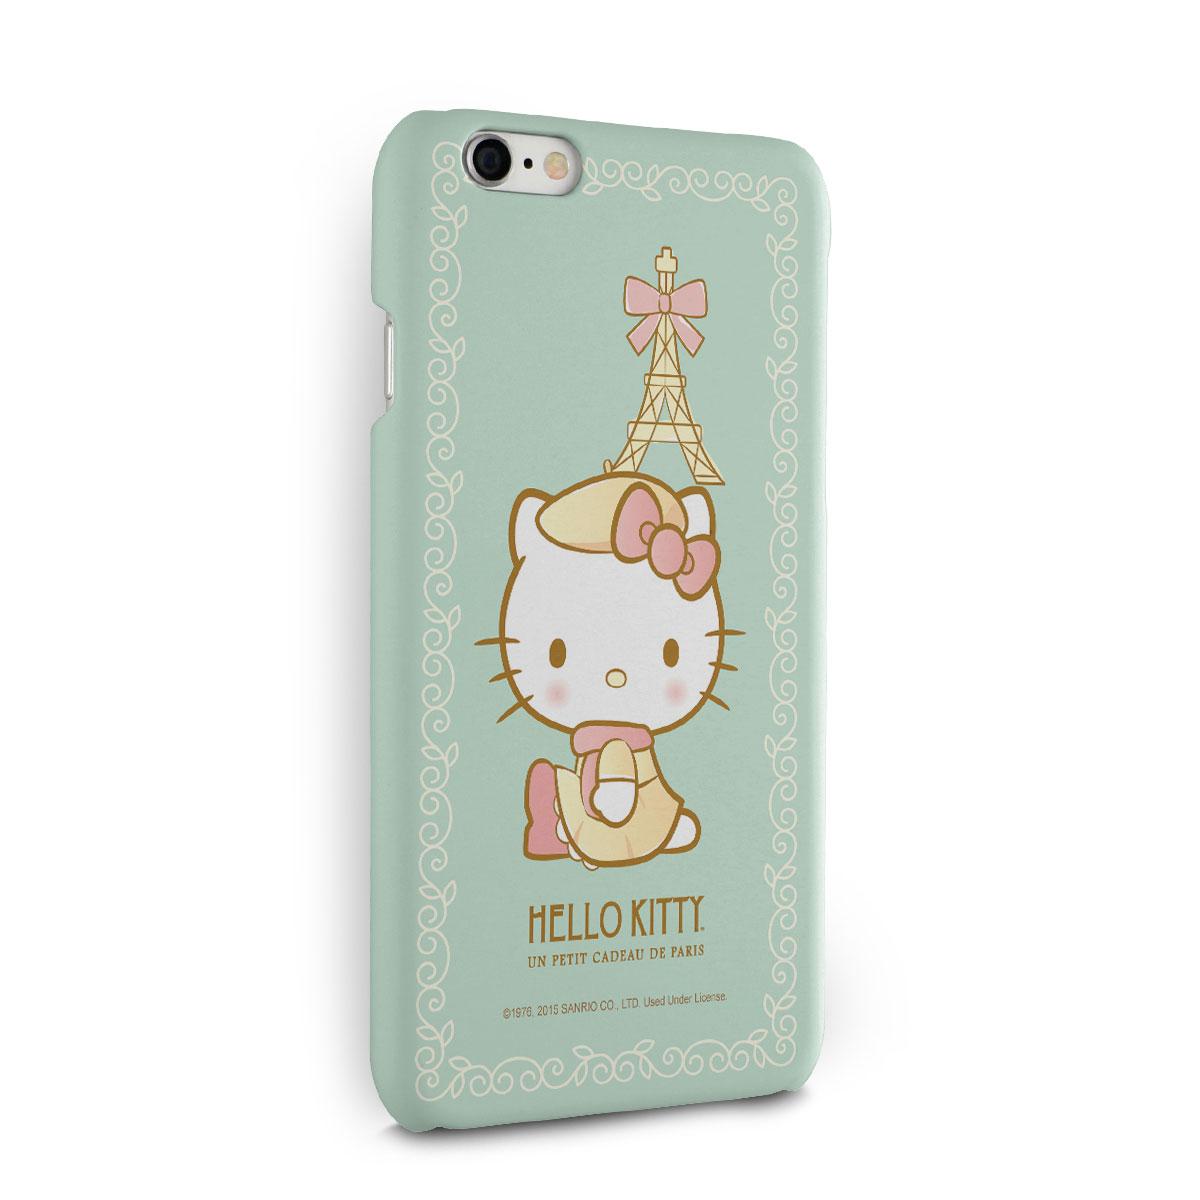 Capa para iPhone 6/6S Hello Kitty Un Petit Cadeau